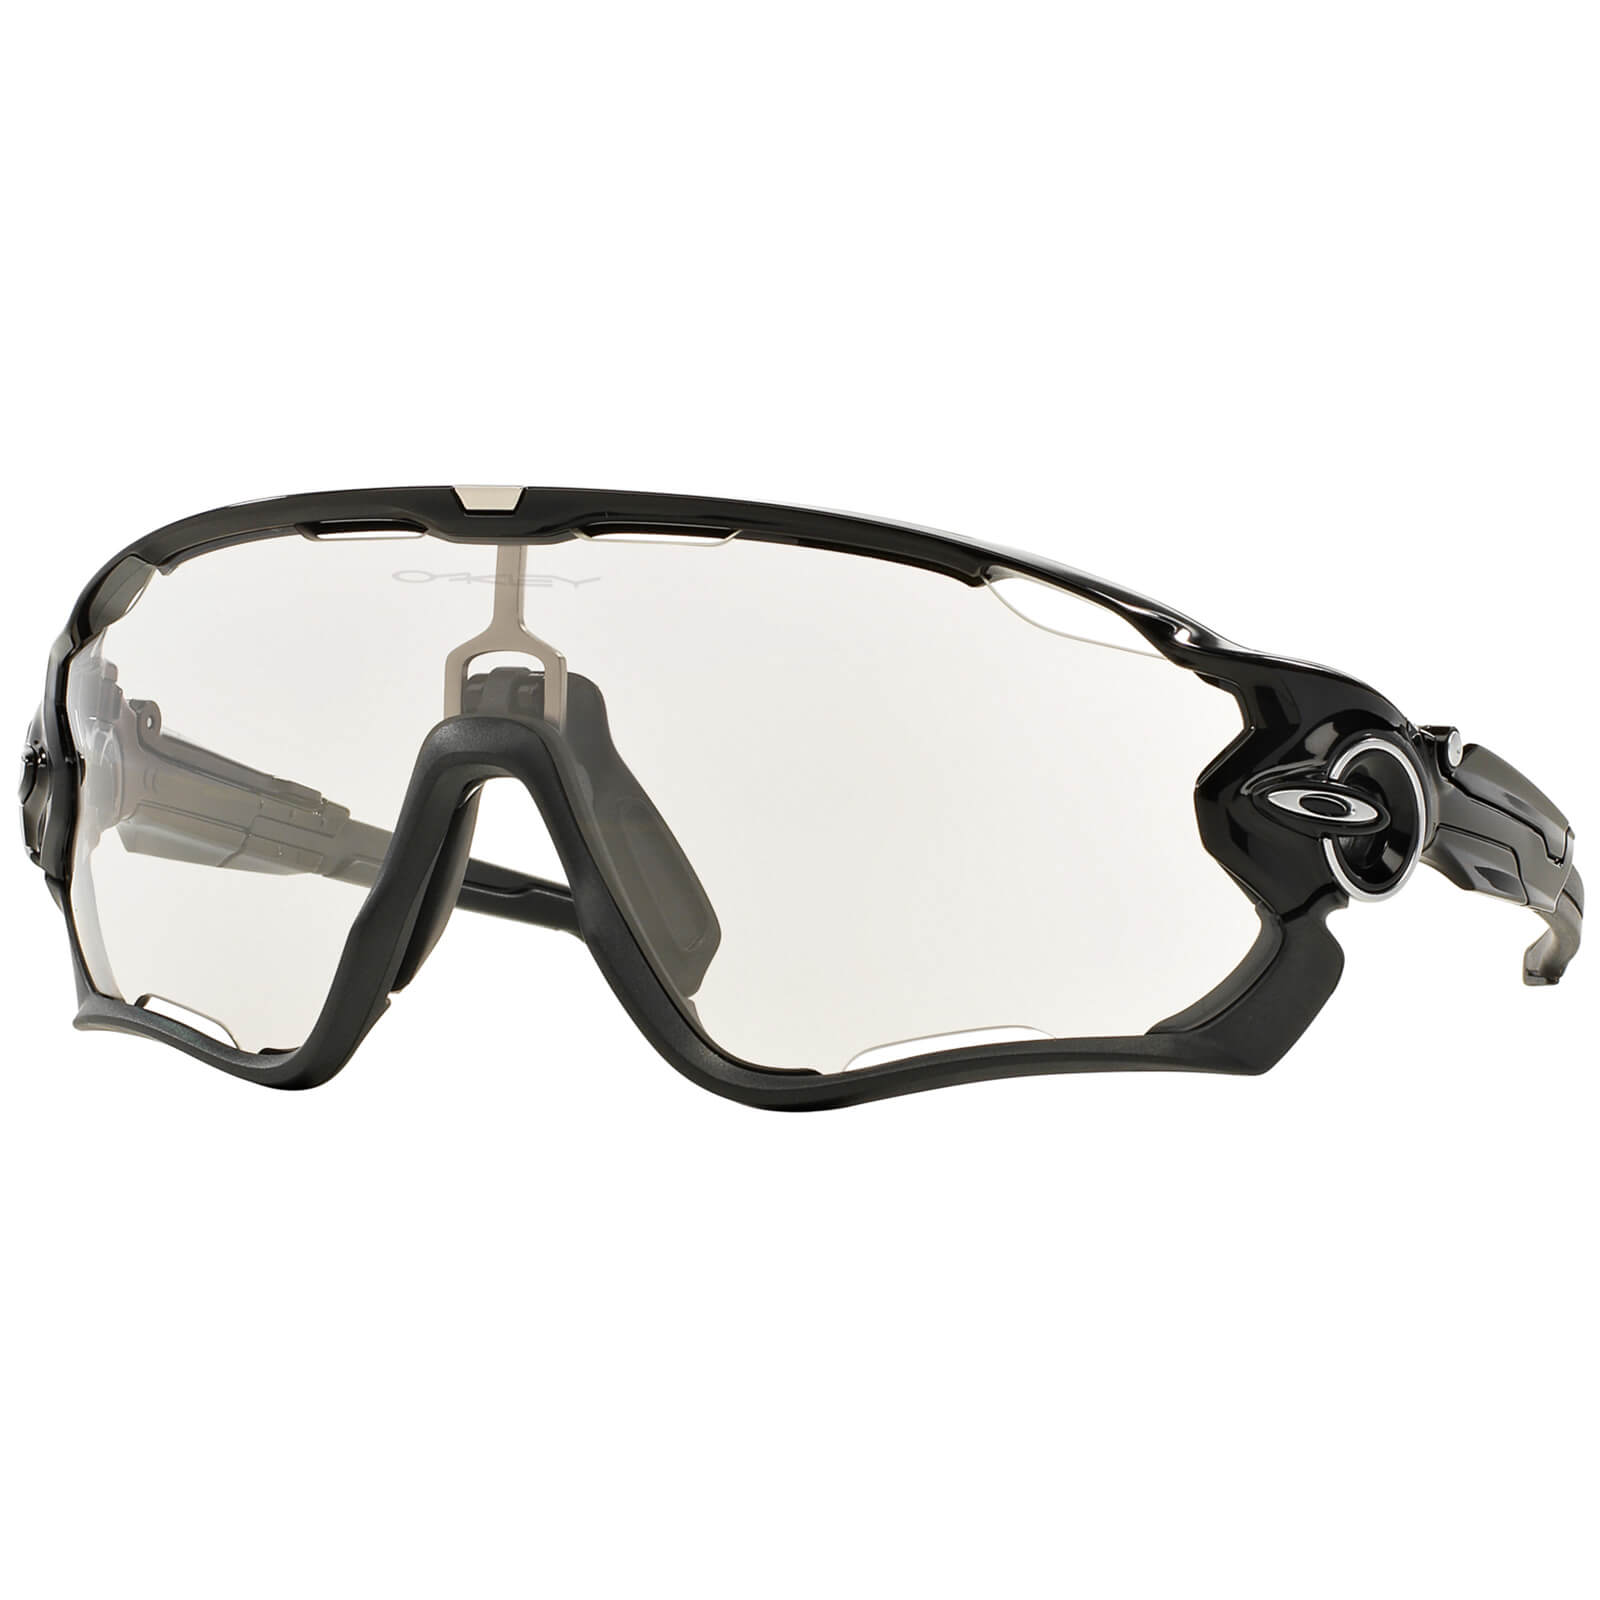 d68c067f07a Oakley Jawbreaker Photochromic Sunglasses - Polished Black Clear Black